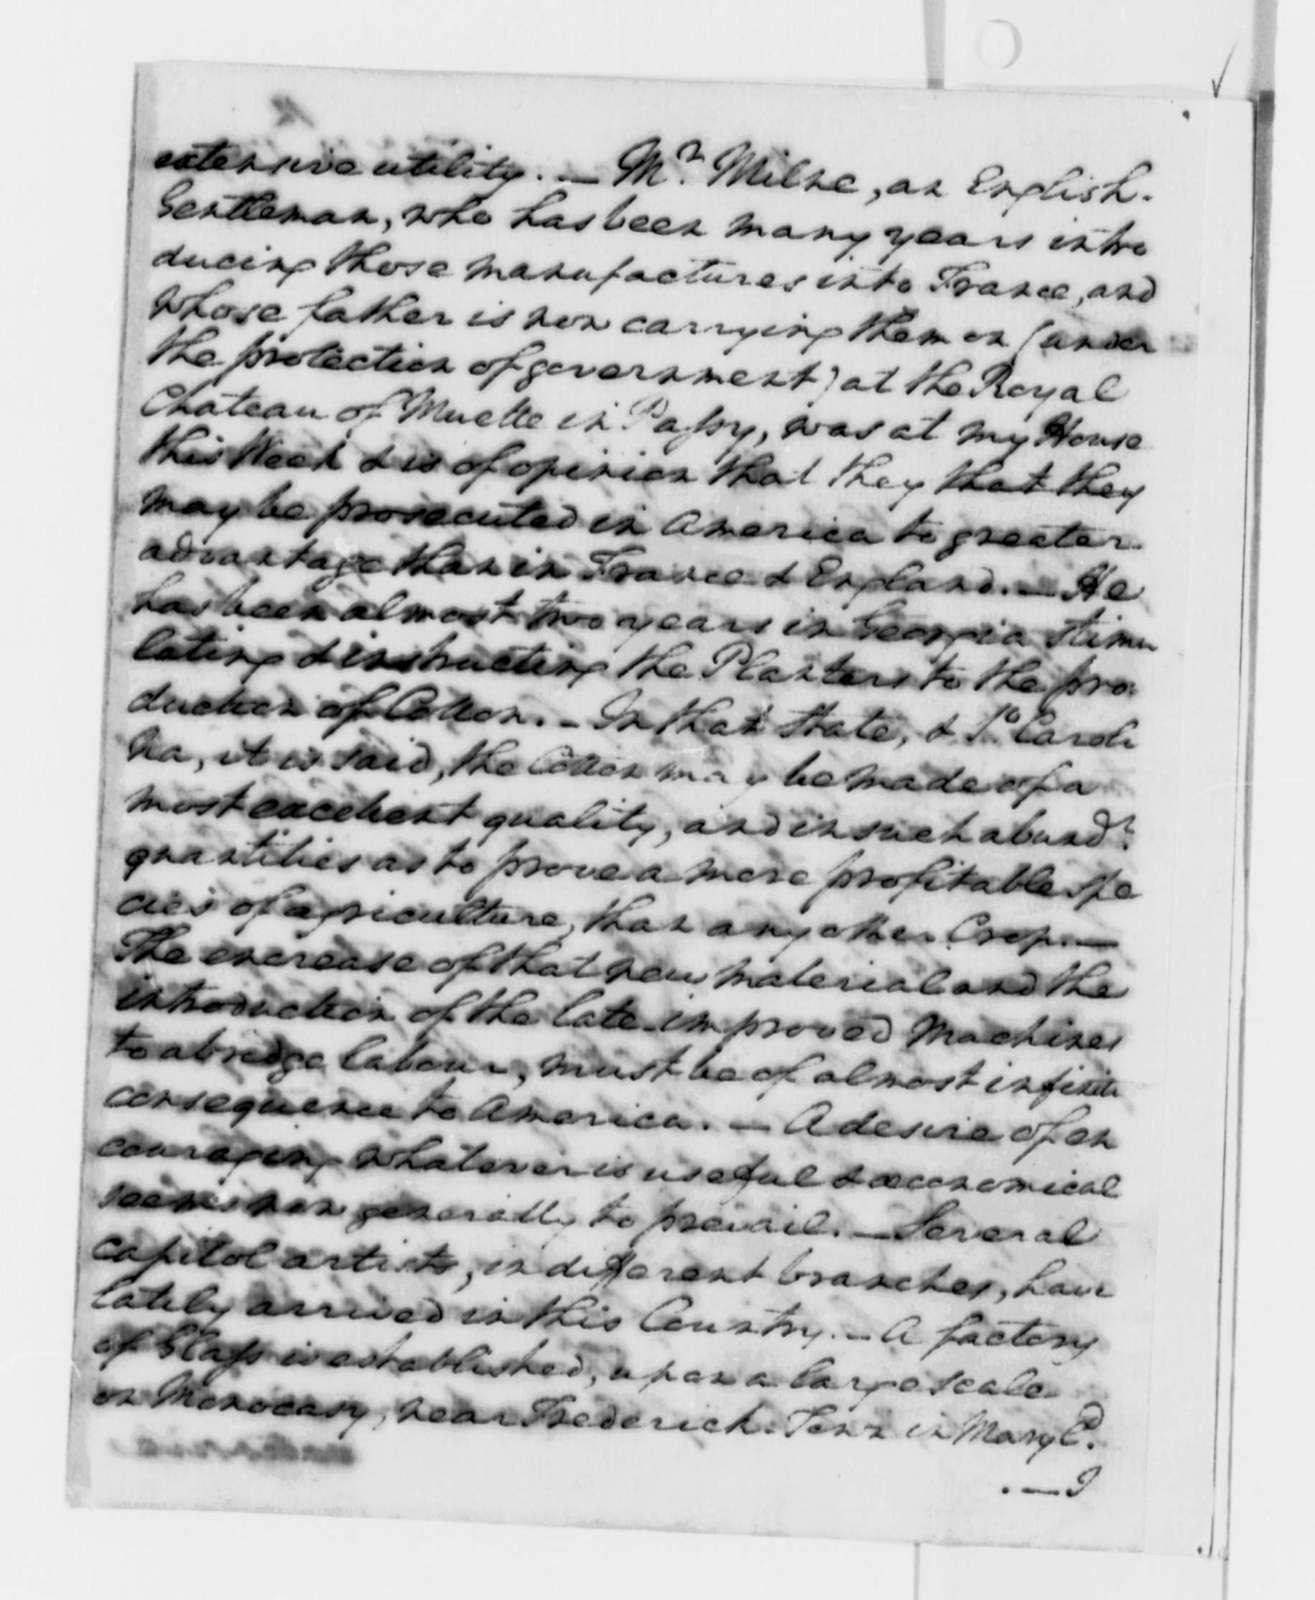 George Washington to Thomas Jefferson, February 13, 1789